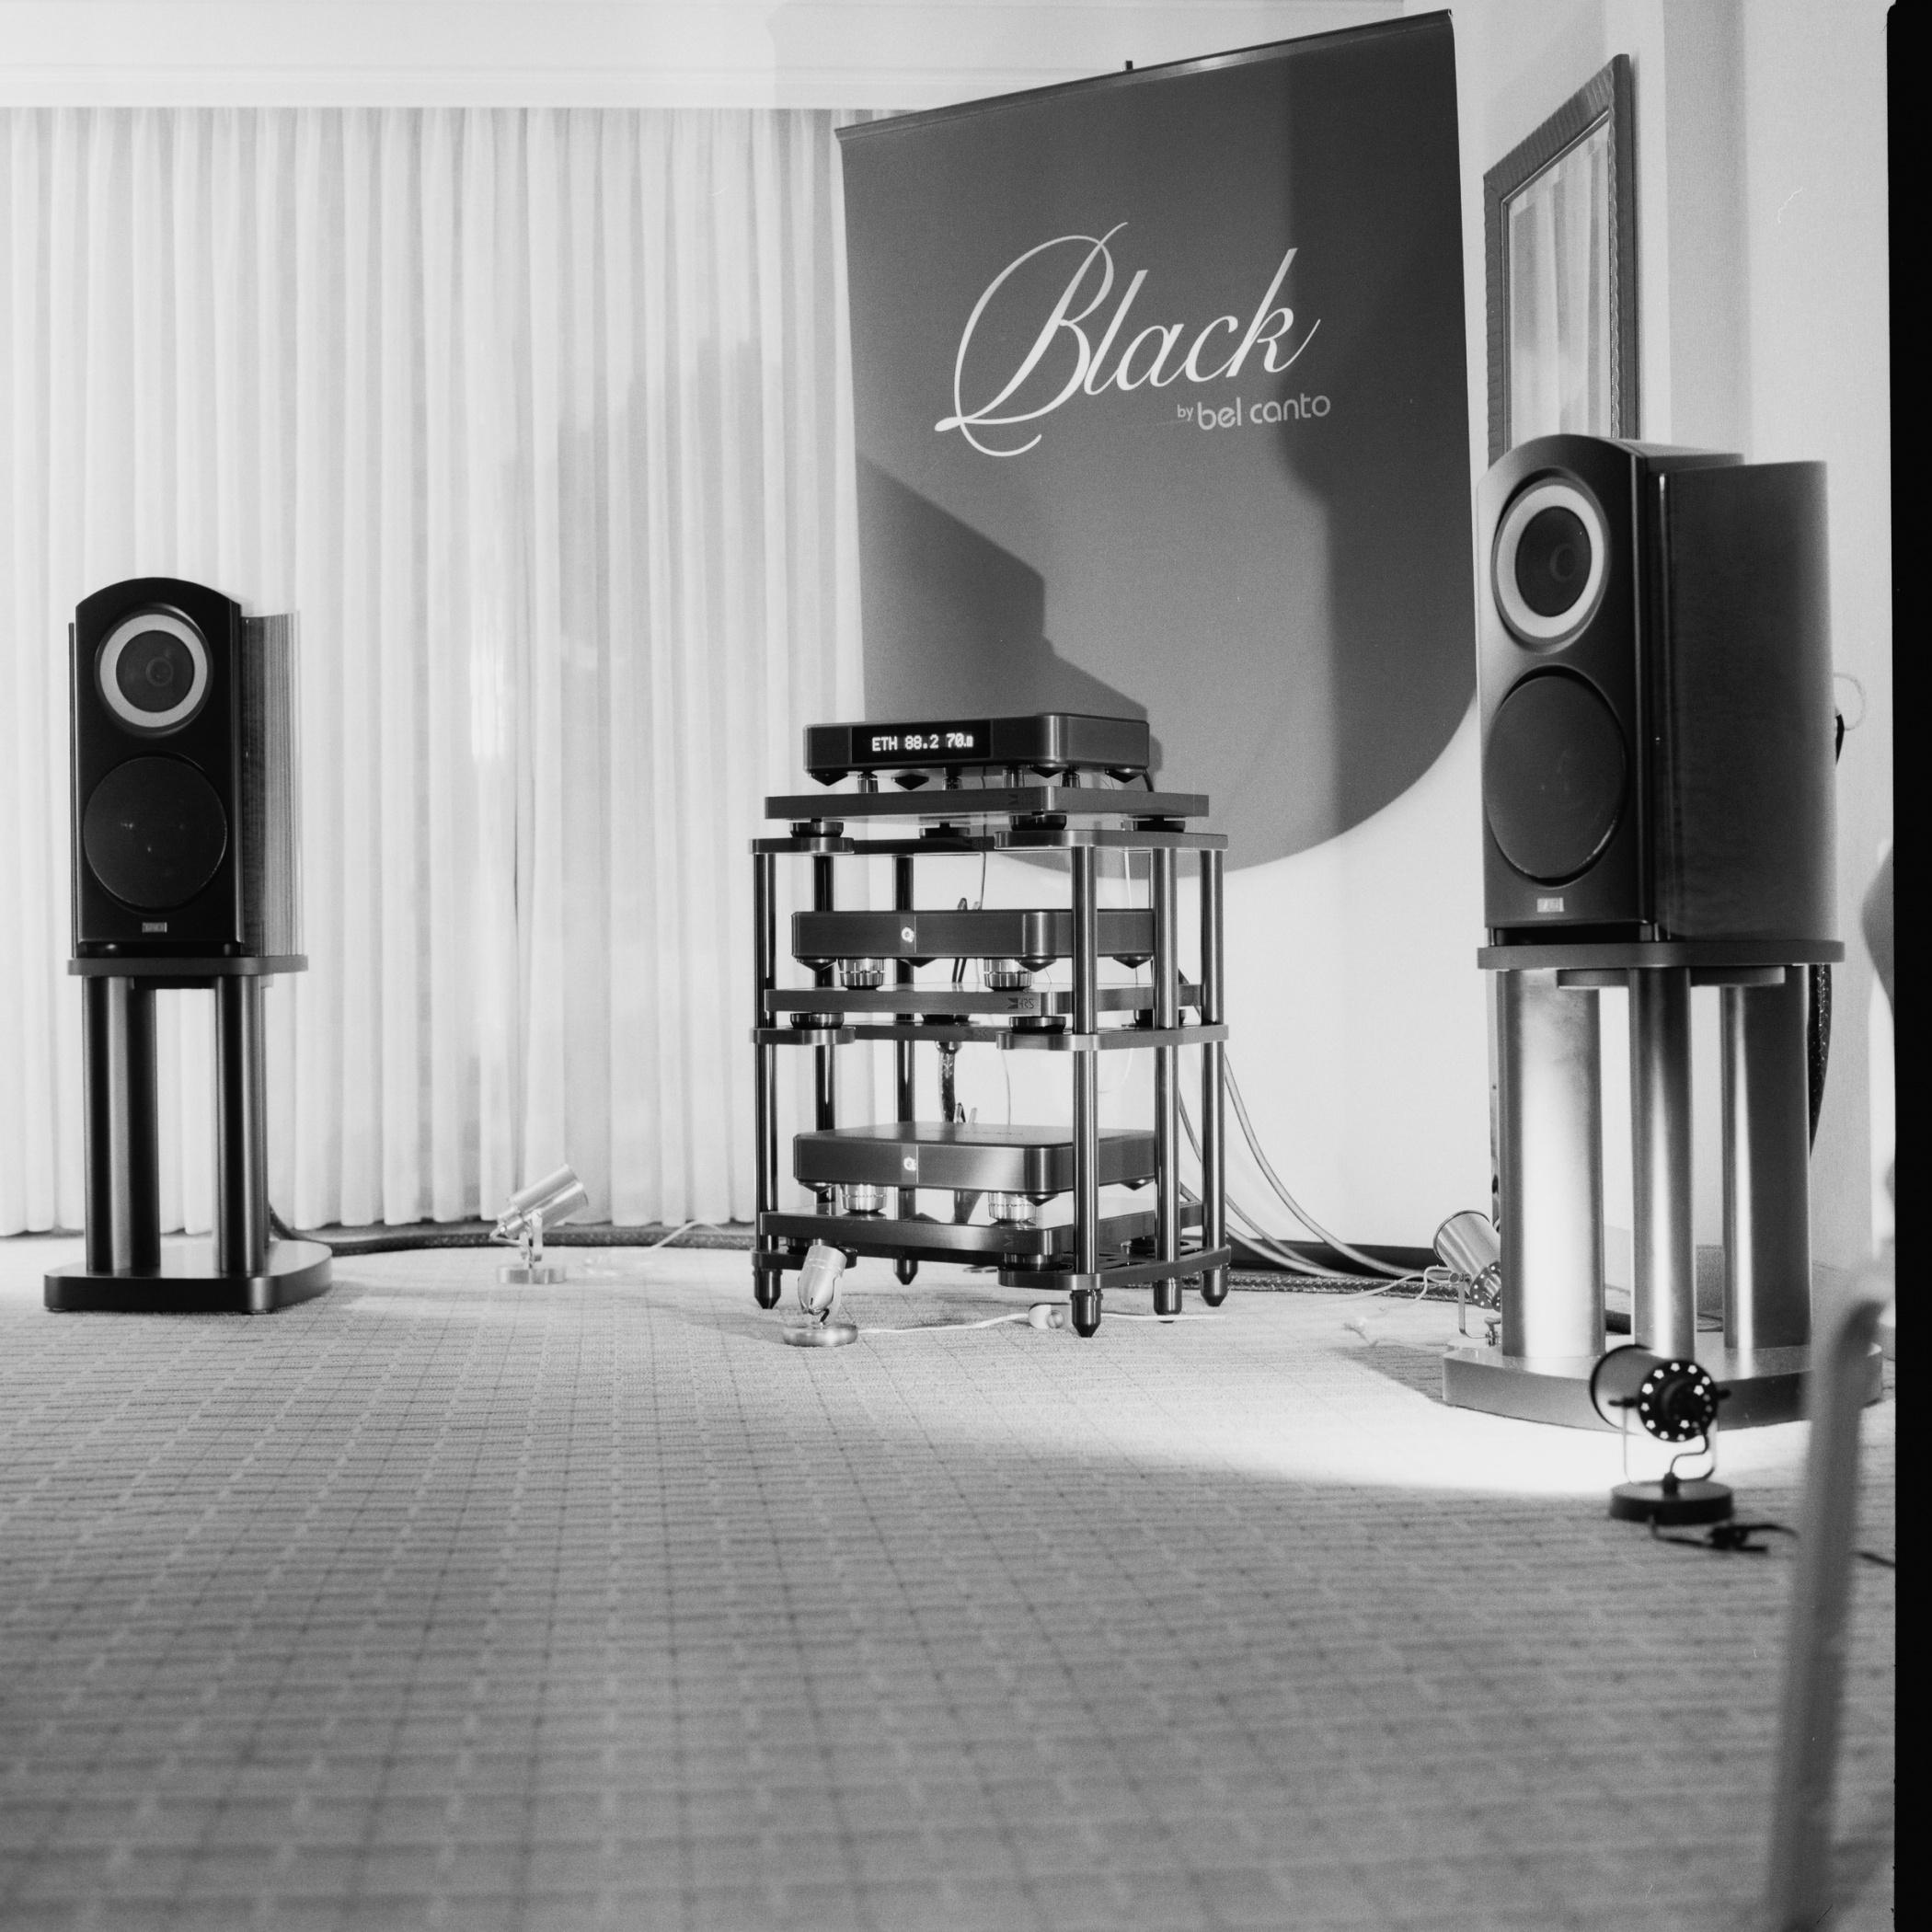 2013-Hasselblad-Black-04